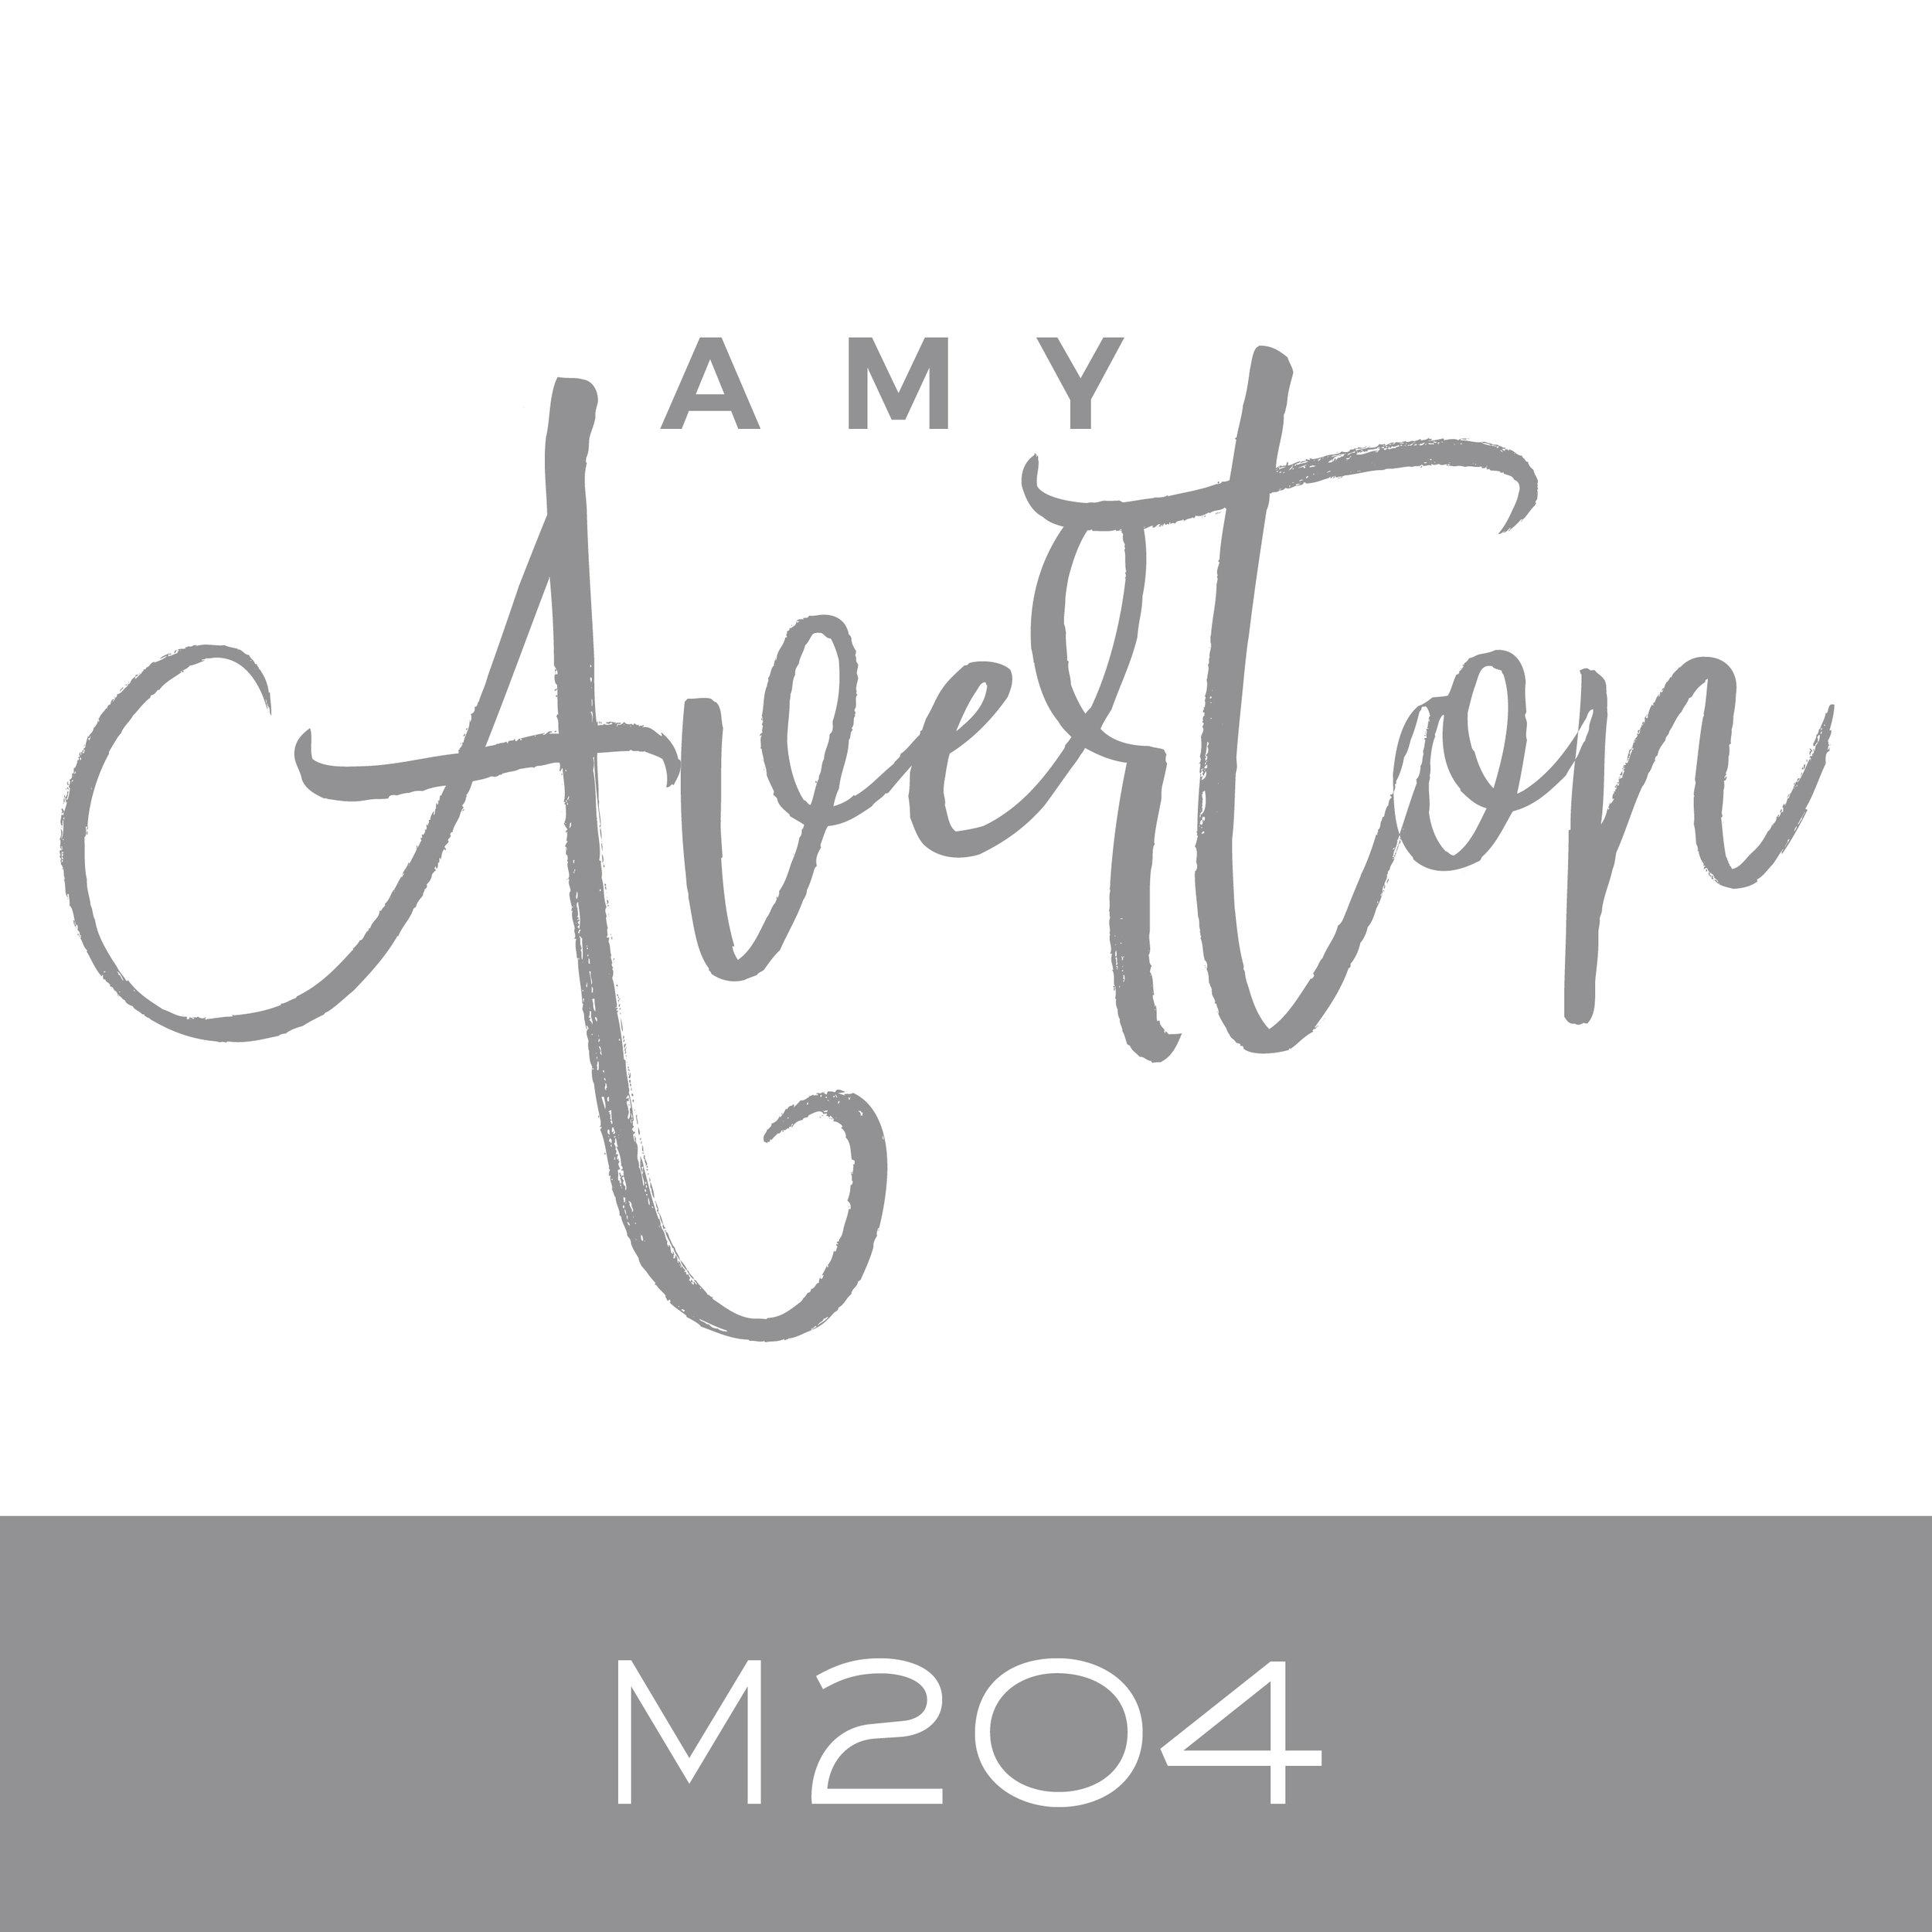 M204.jpg